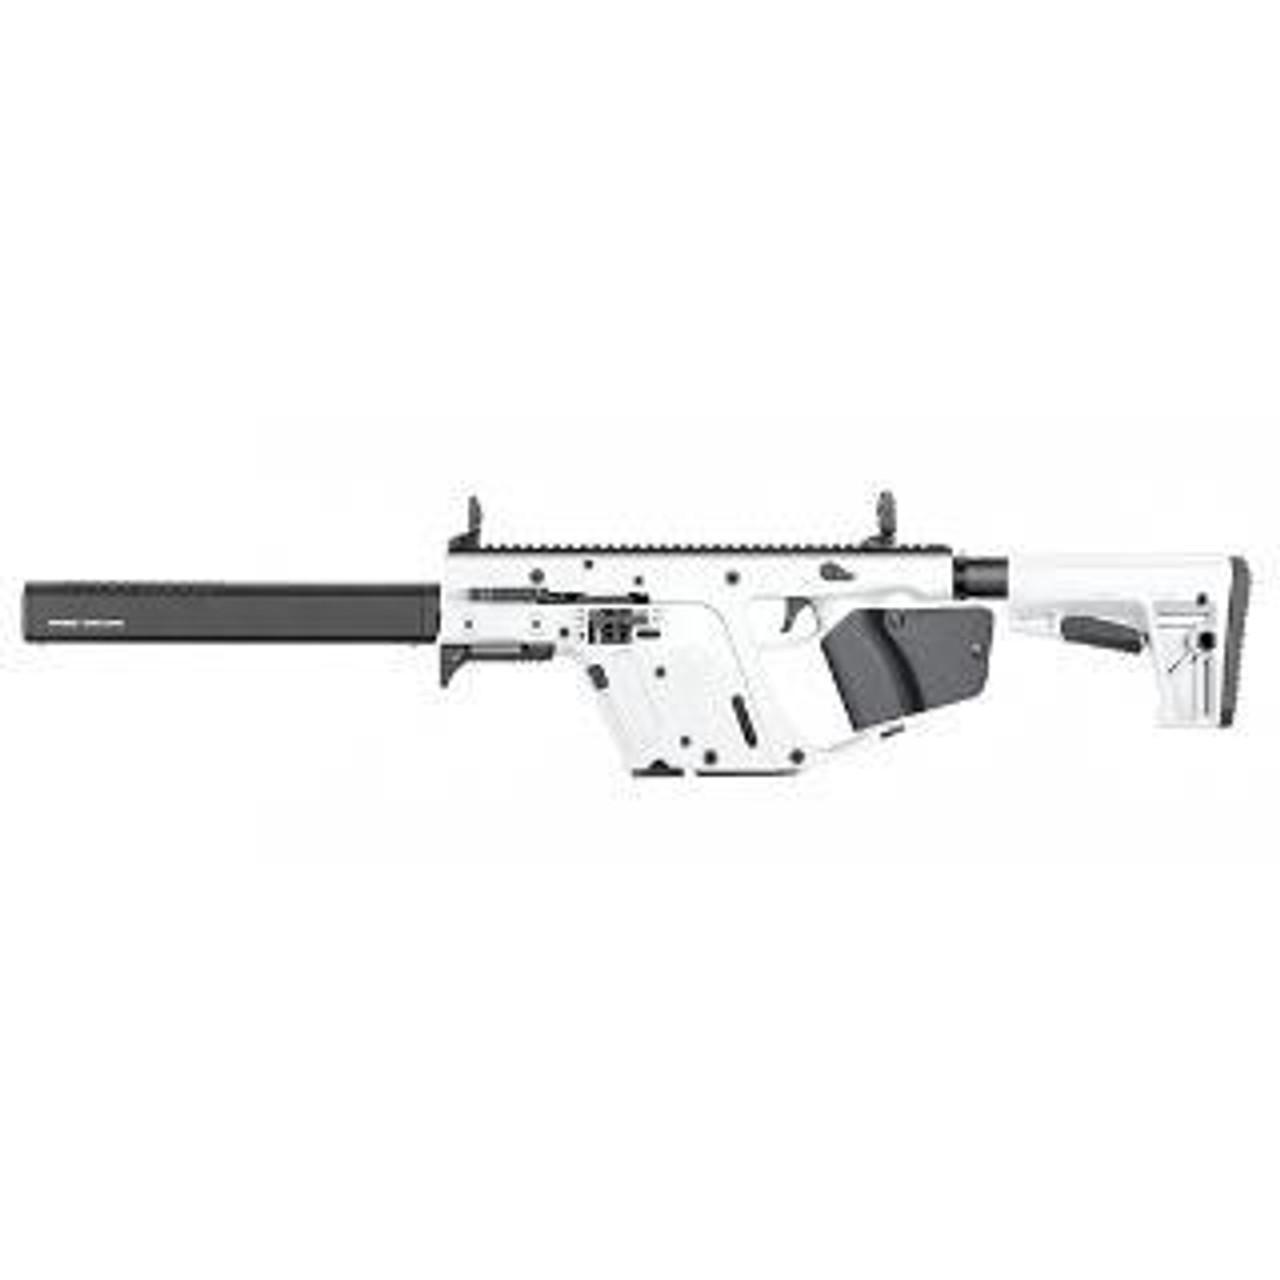 Kriss Vector -  Alpine White - Factory California Legal - 9mm